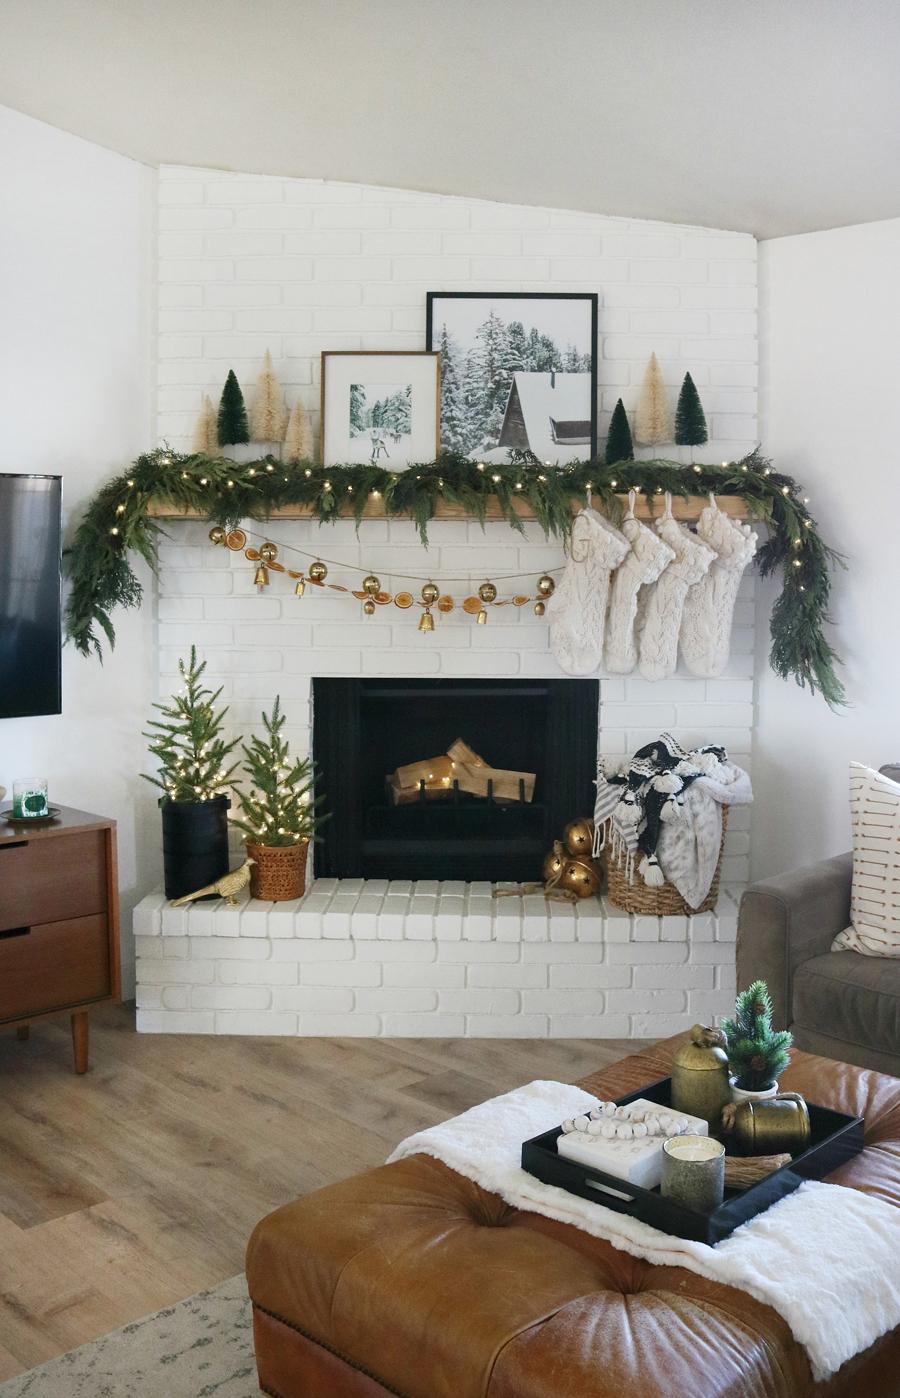 Modern & Cozy Christmas Mantel Decor